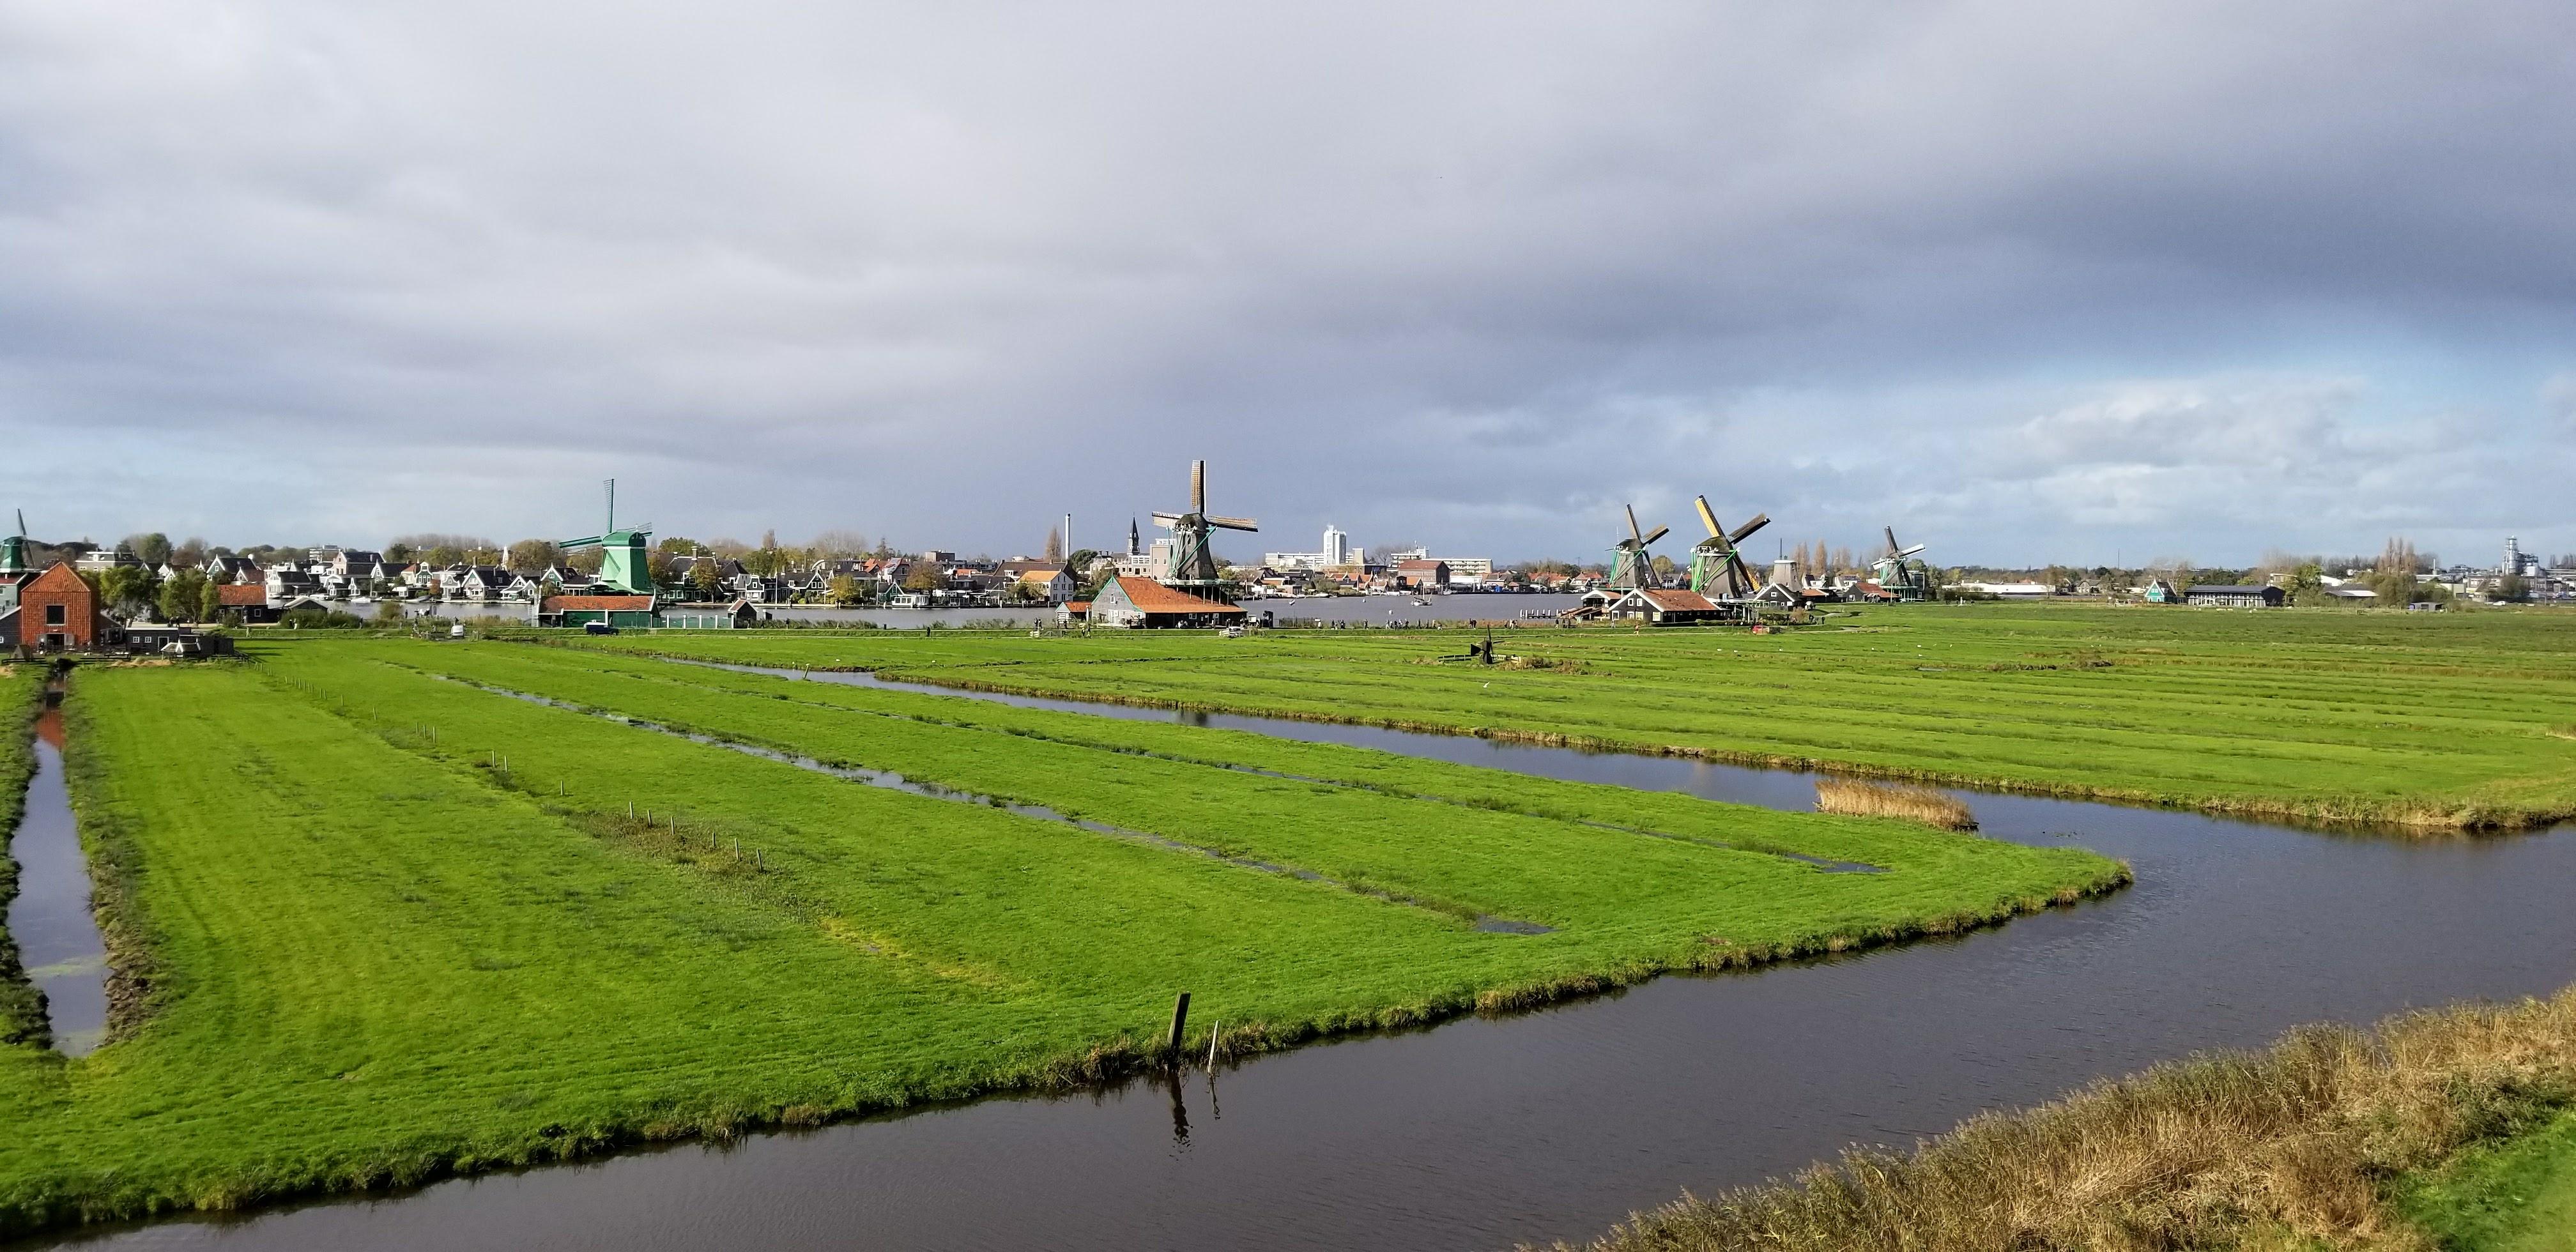 CAPAStudyAbroad_London_Fall2017_From Thaddeus Kaszuba - Fall Break_Peaceful Fields with Windmills In Zaanse Schans.jpg